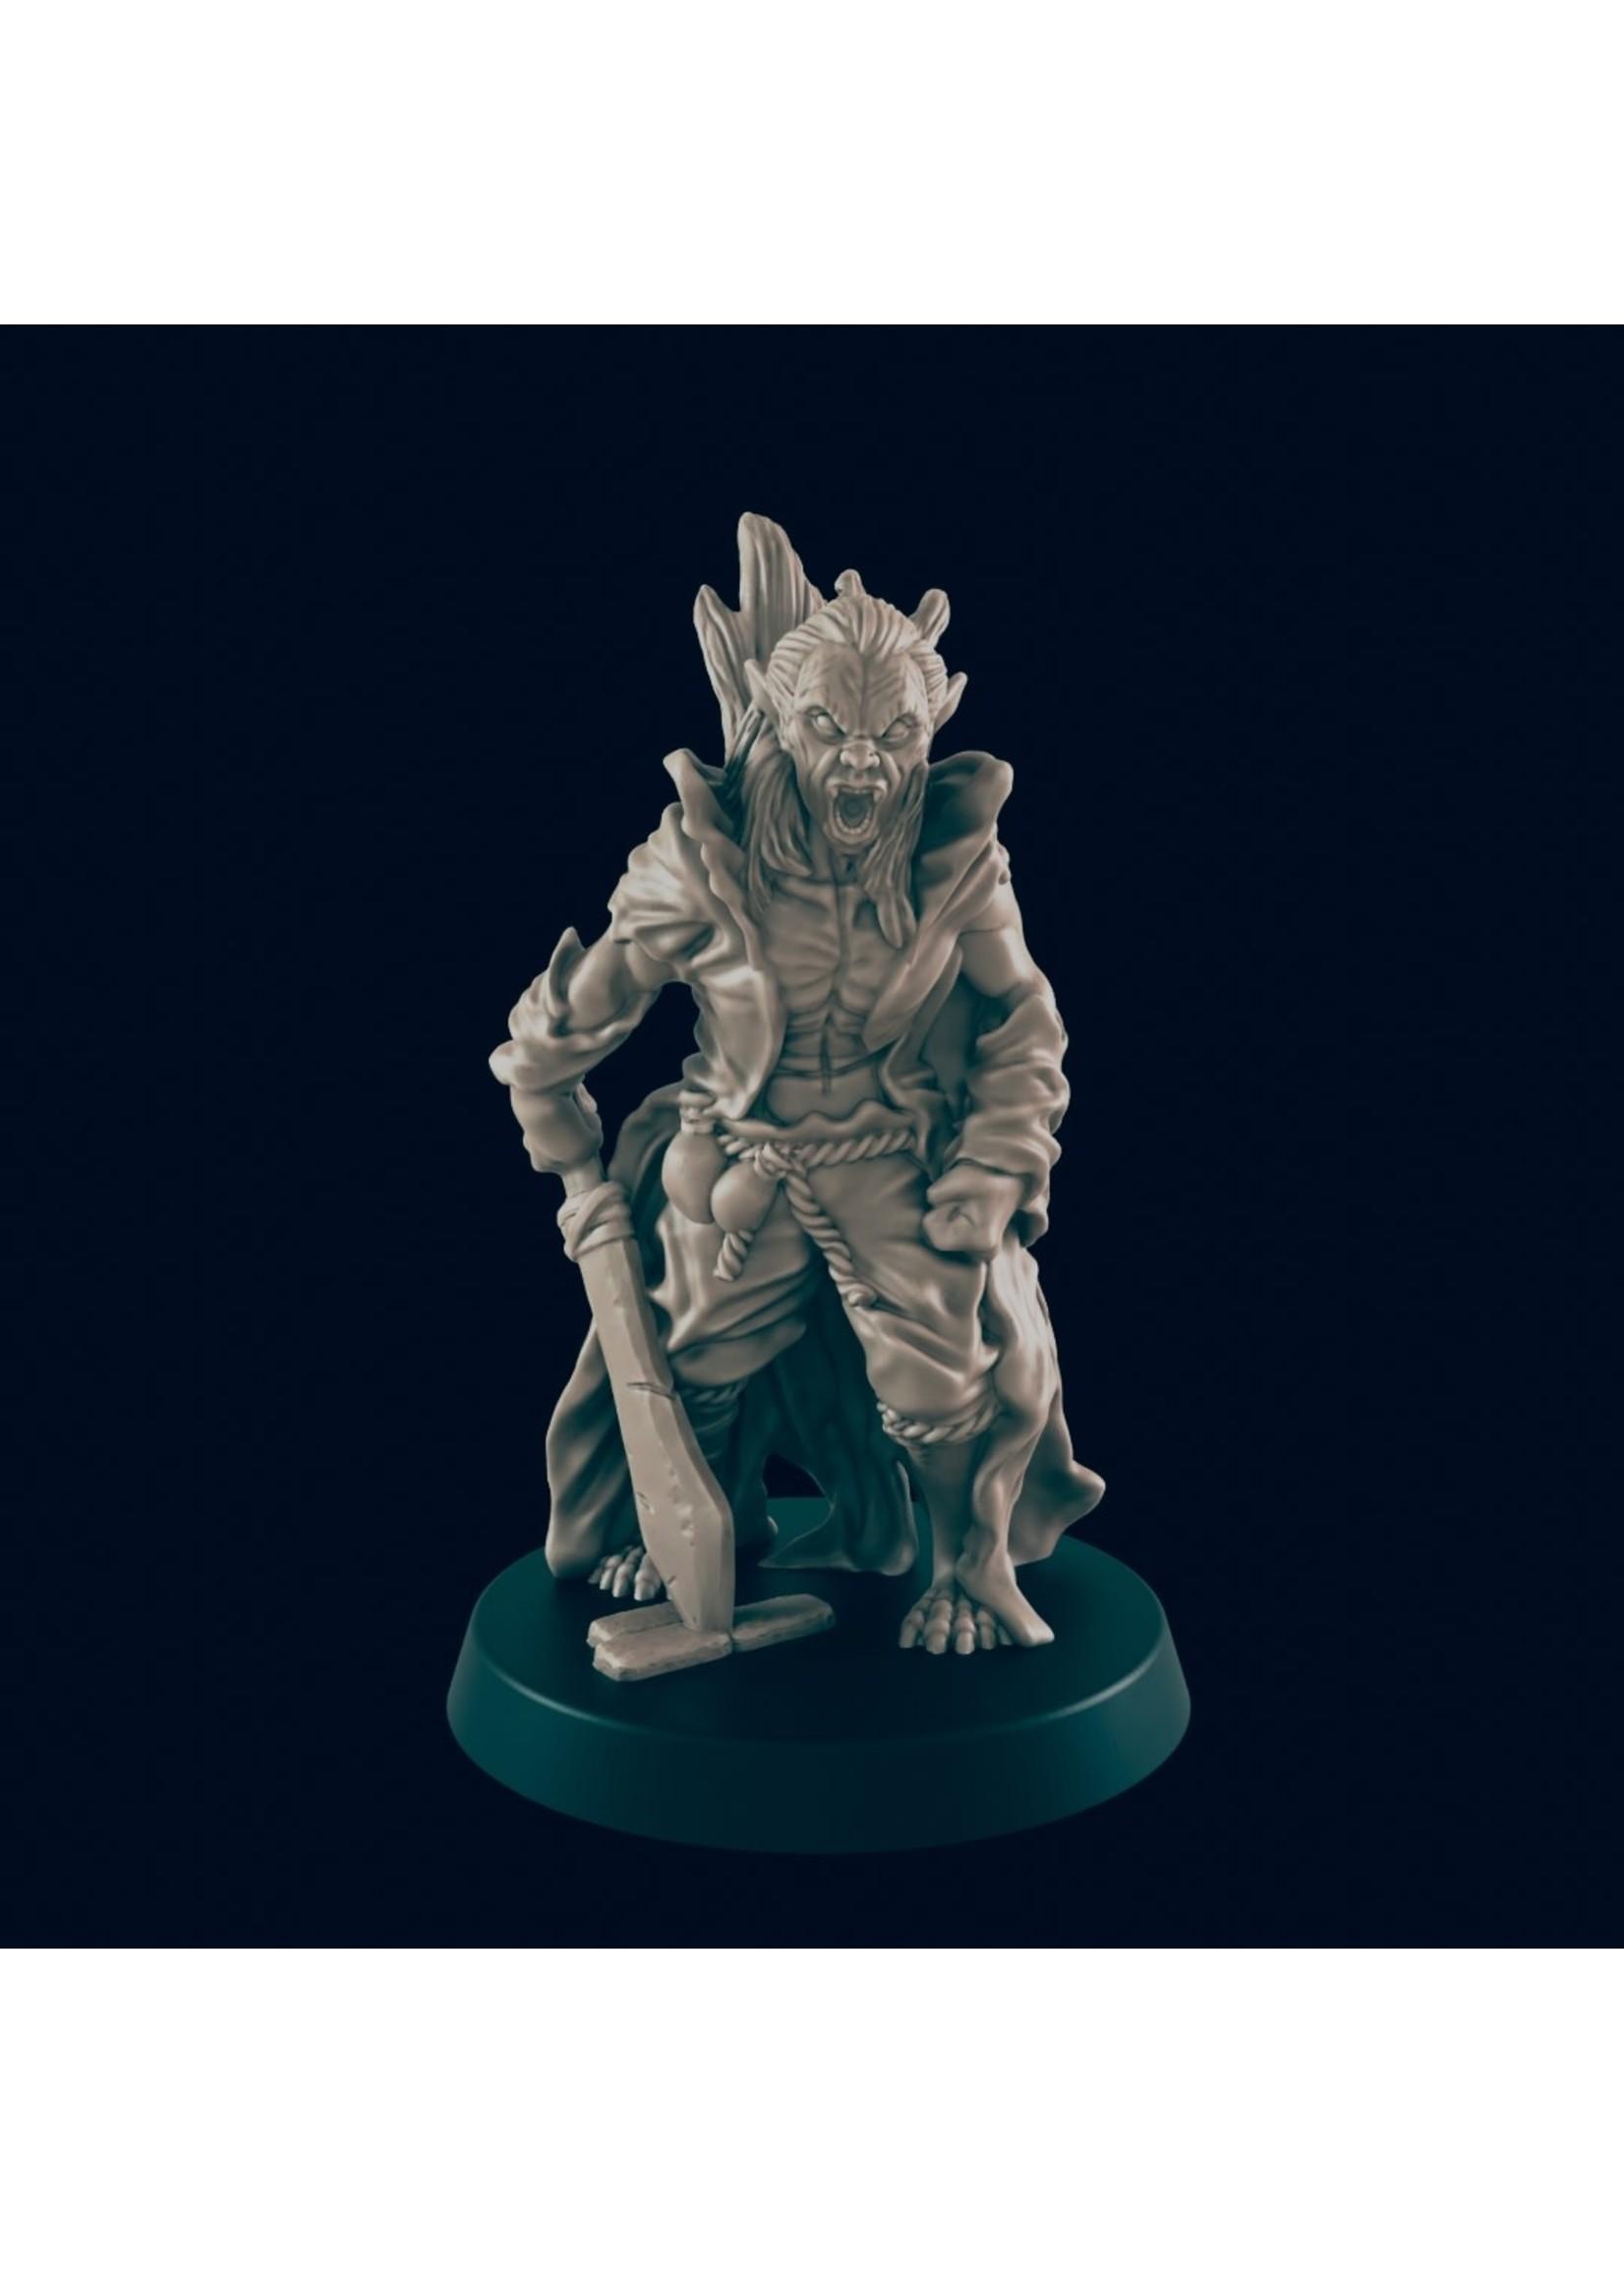 3D Printed Miniature - Vampire Thrall 2 - Dungeons & Dragons - Beasts and Baddies KS